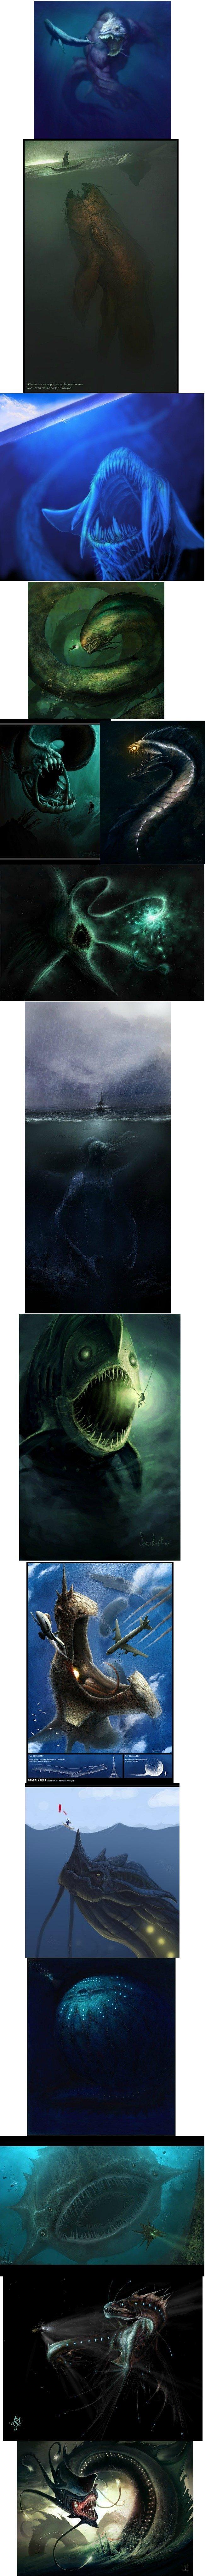 Leviathan comp. .